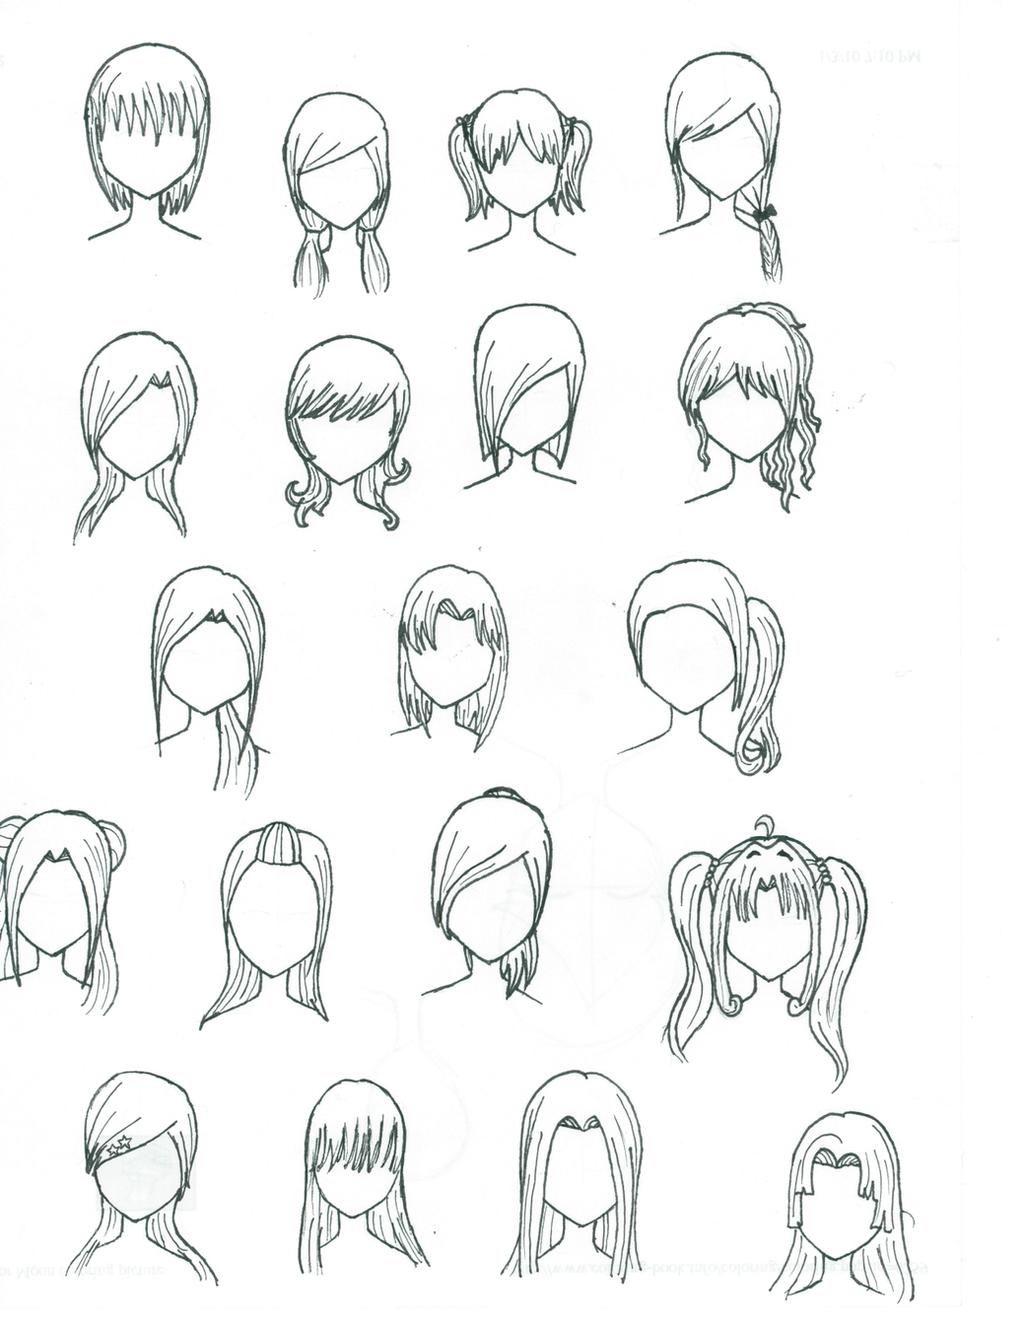 Anime Sketch Hair Eyeviewnet Com